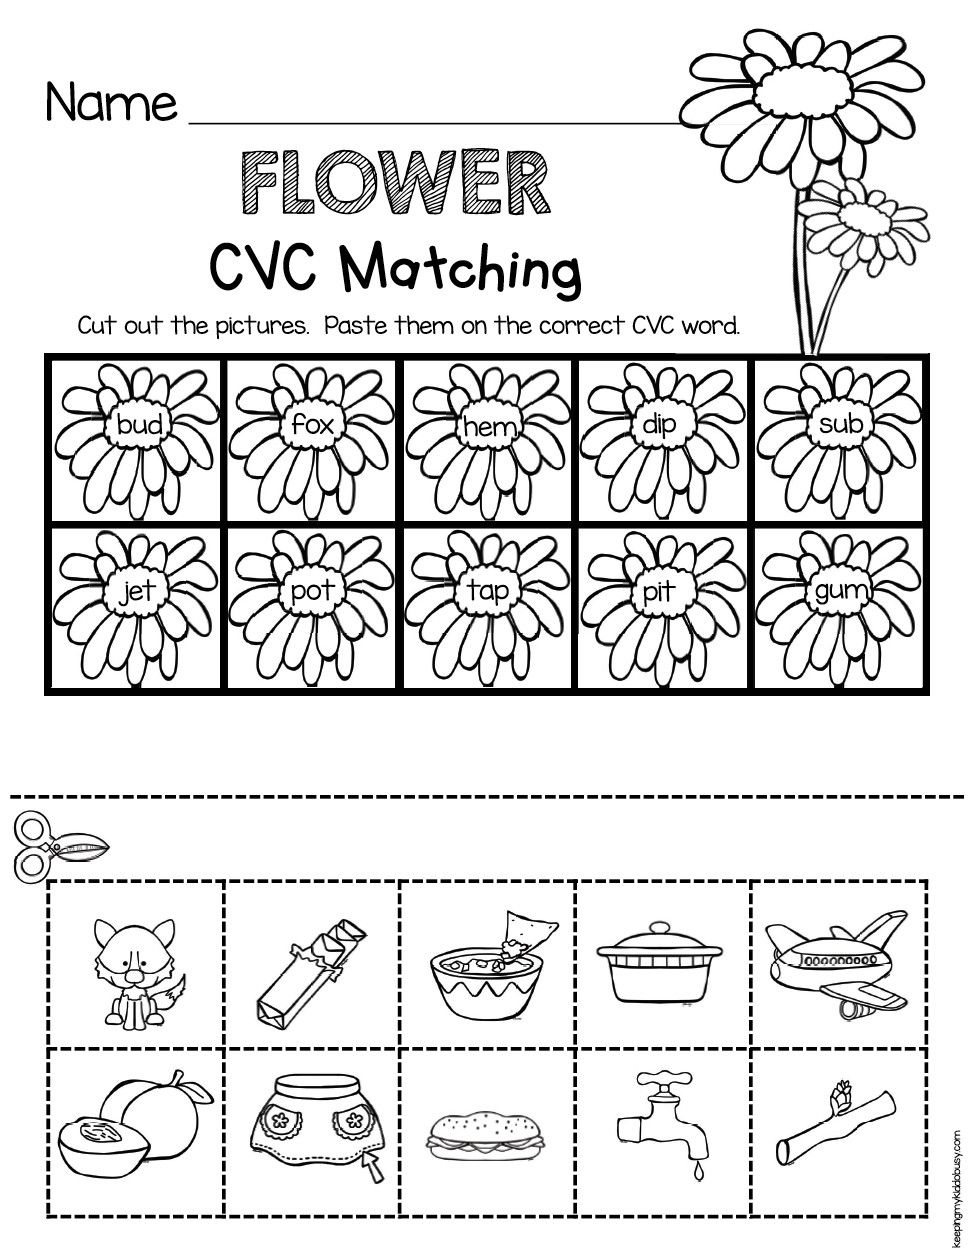 2 Spring Reading Worksheet in 2020 Cvc words